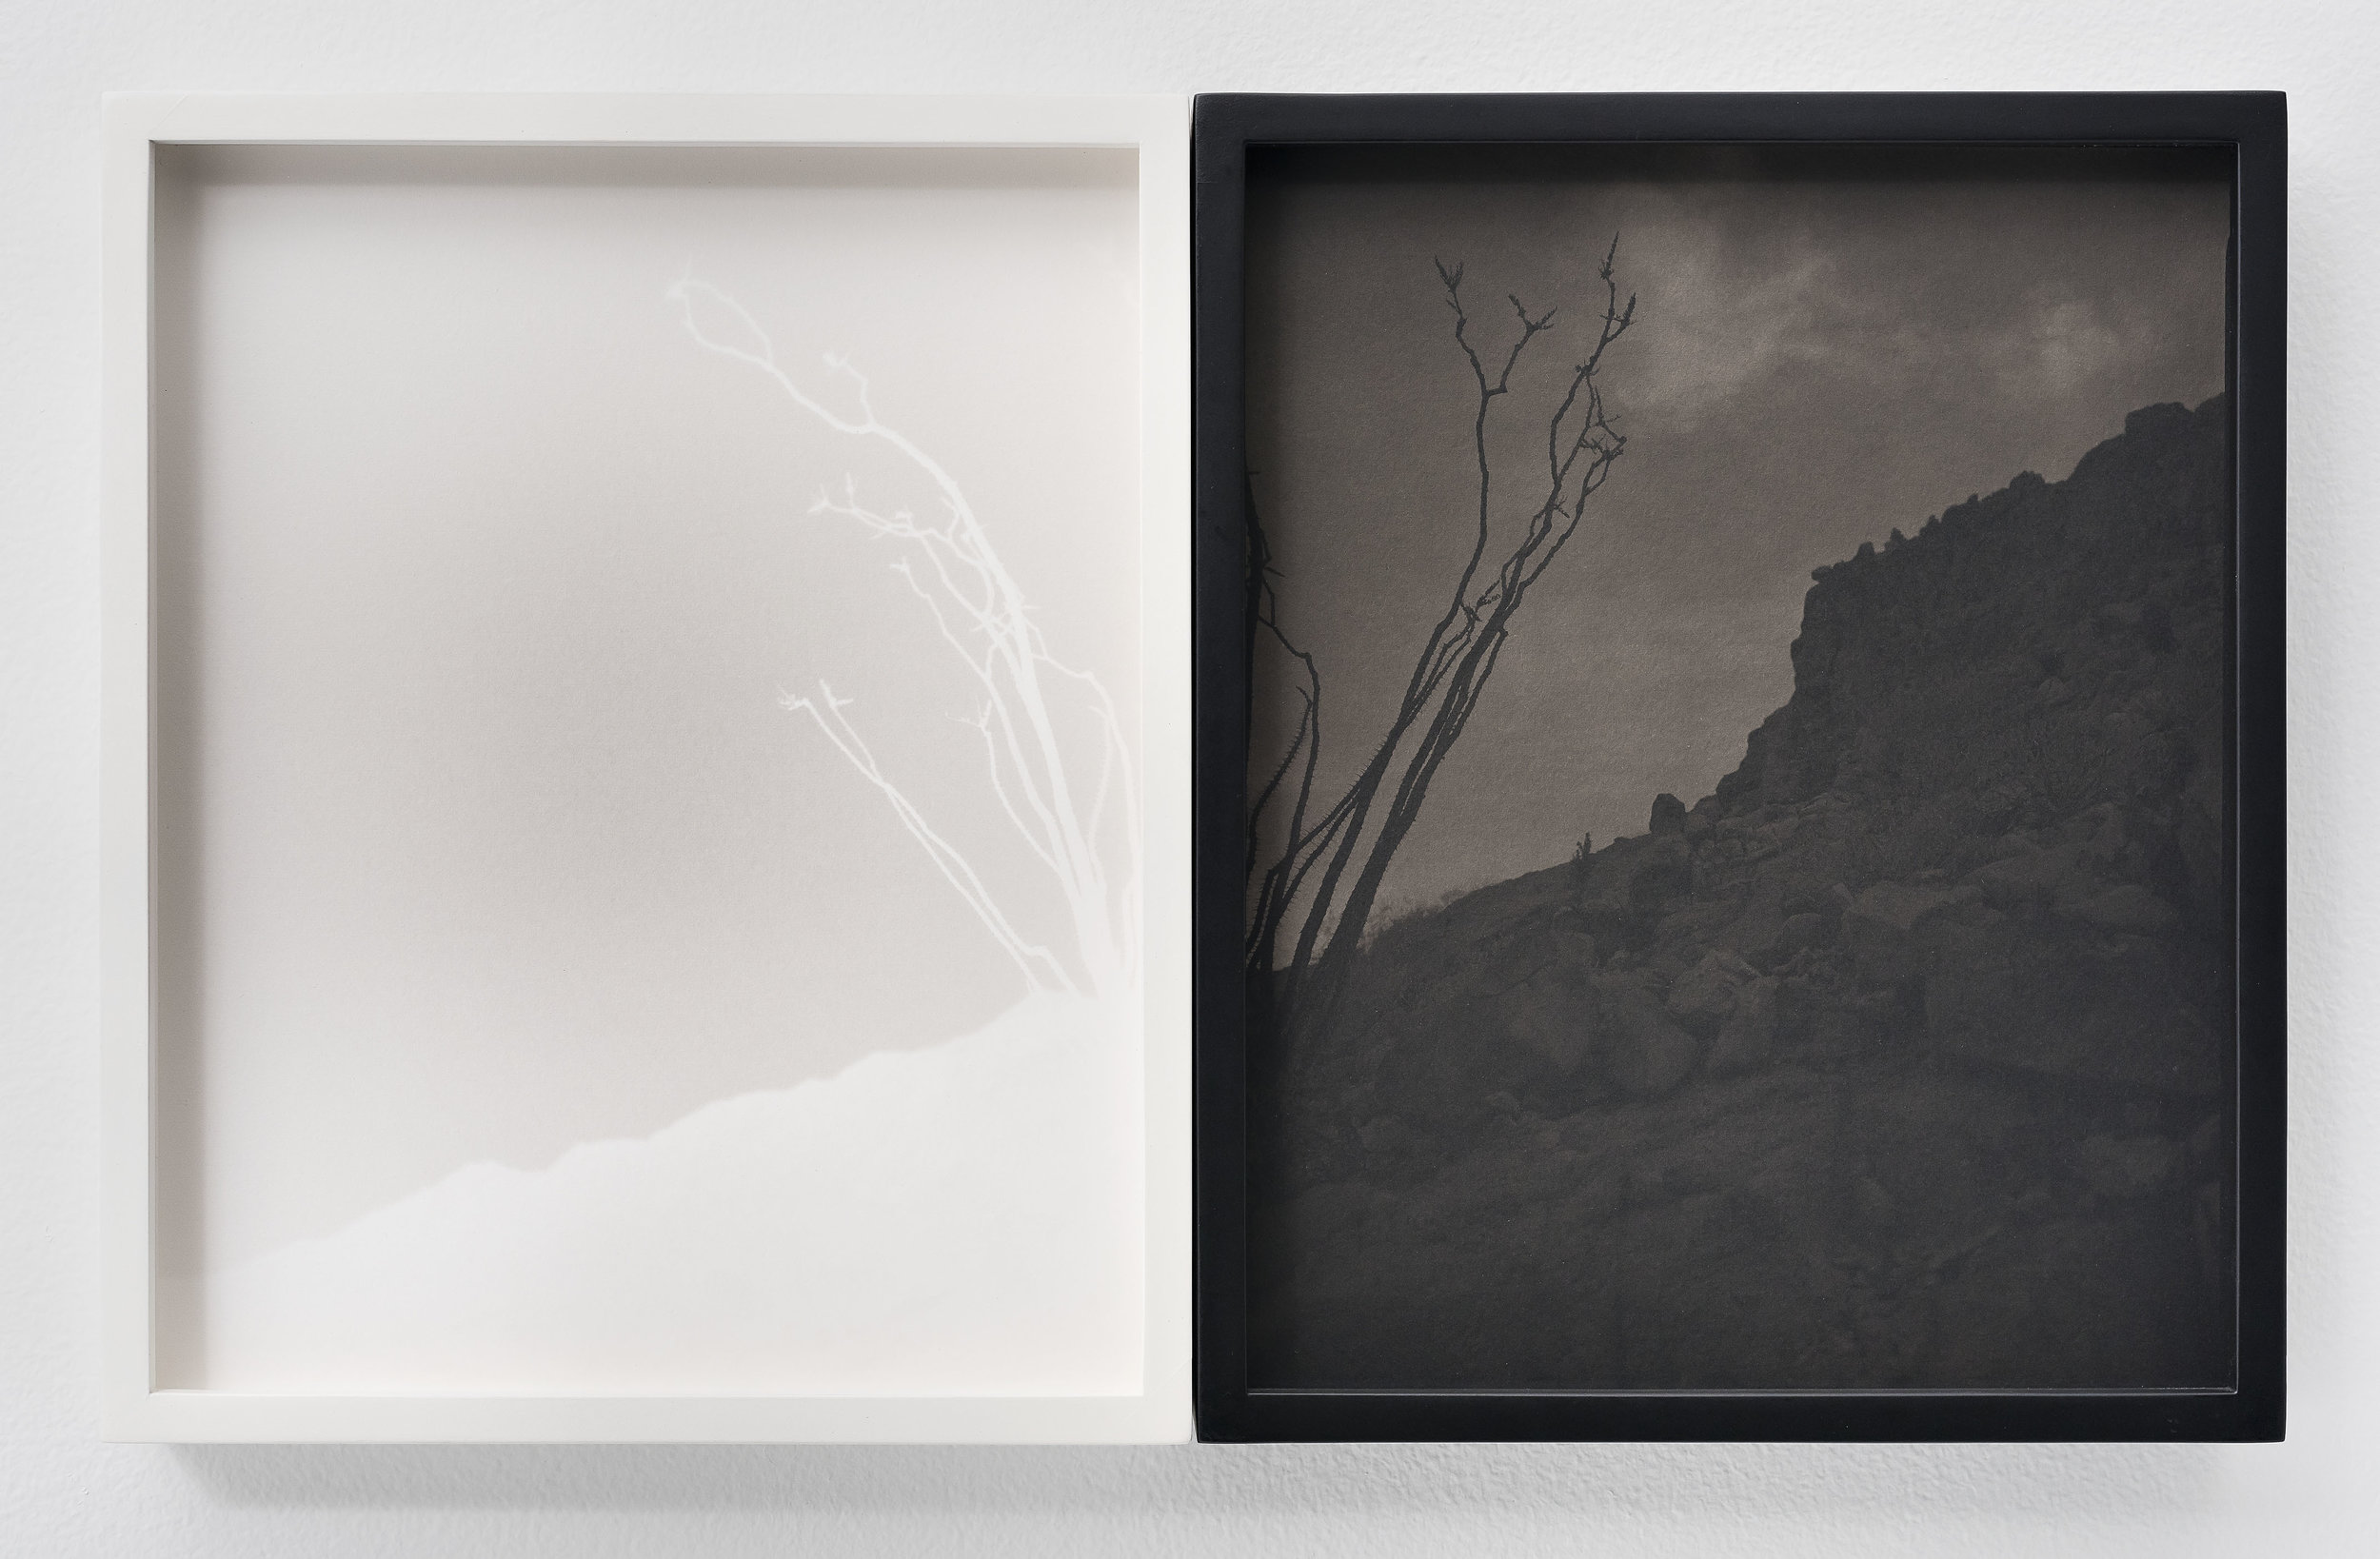 SCOTT B. DAVIS  Ocotillo, Ocotillo (No. 58),  2018 Unique paper negative palladium/platinum prints, diptych 10 x 16 inches